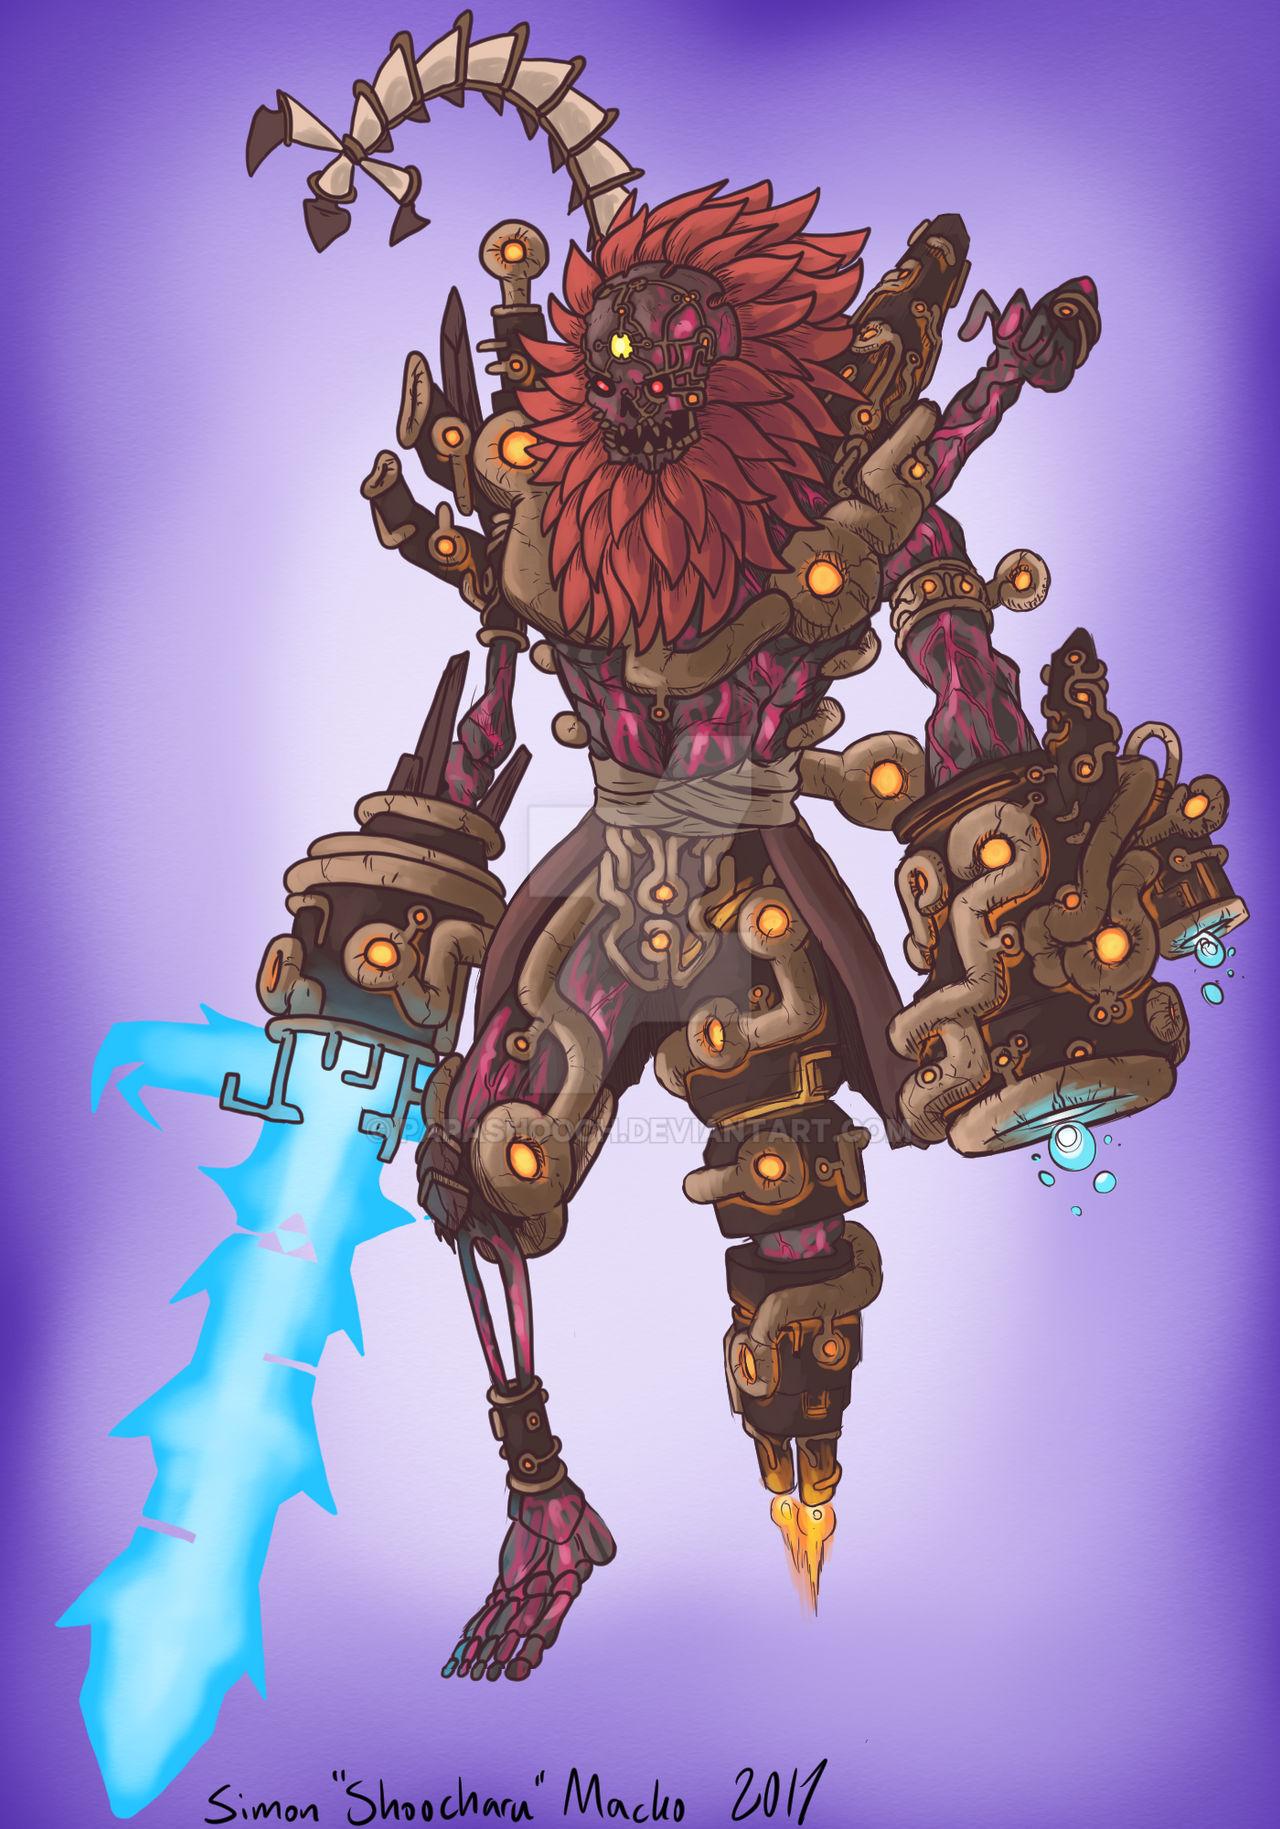 Calamity Ganon Humanoid Form By Papashooch On Deviantart